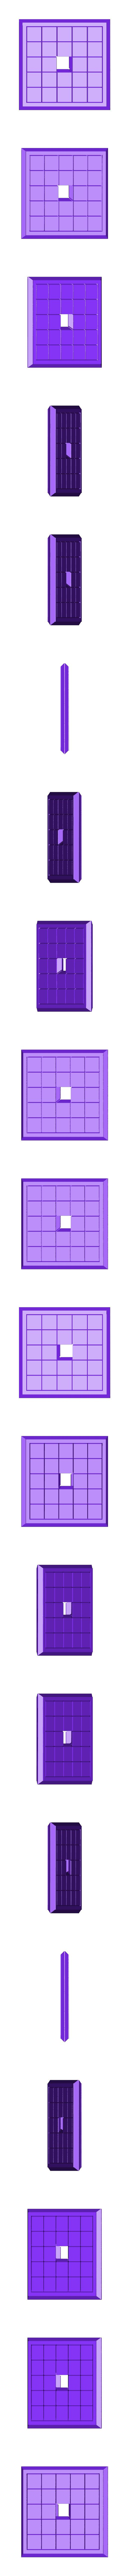 Sliding5x5BlankPuzzle6.stl Download STL file Two Sided Sliding Puzzle • 3D printable model, Jinja